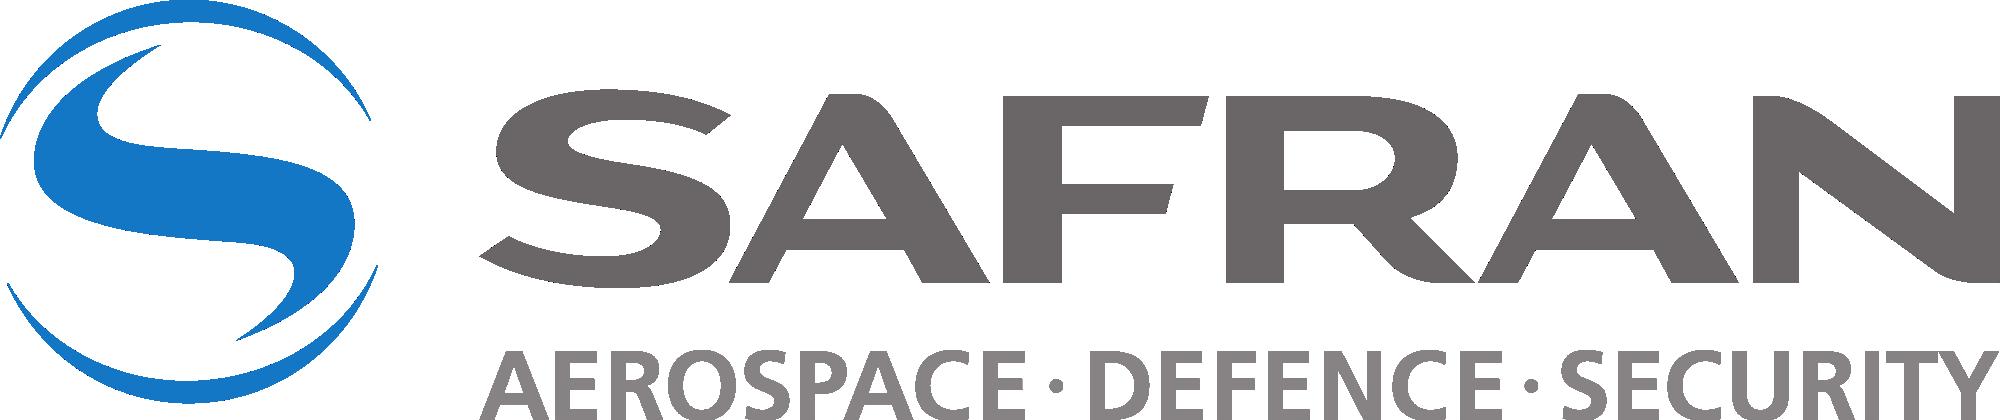 SAFRAN/ADR logo